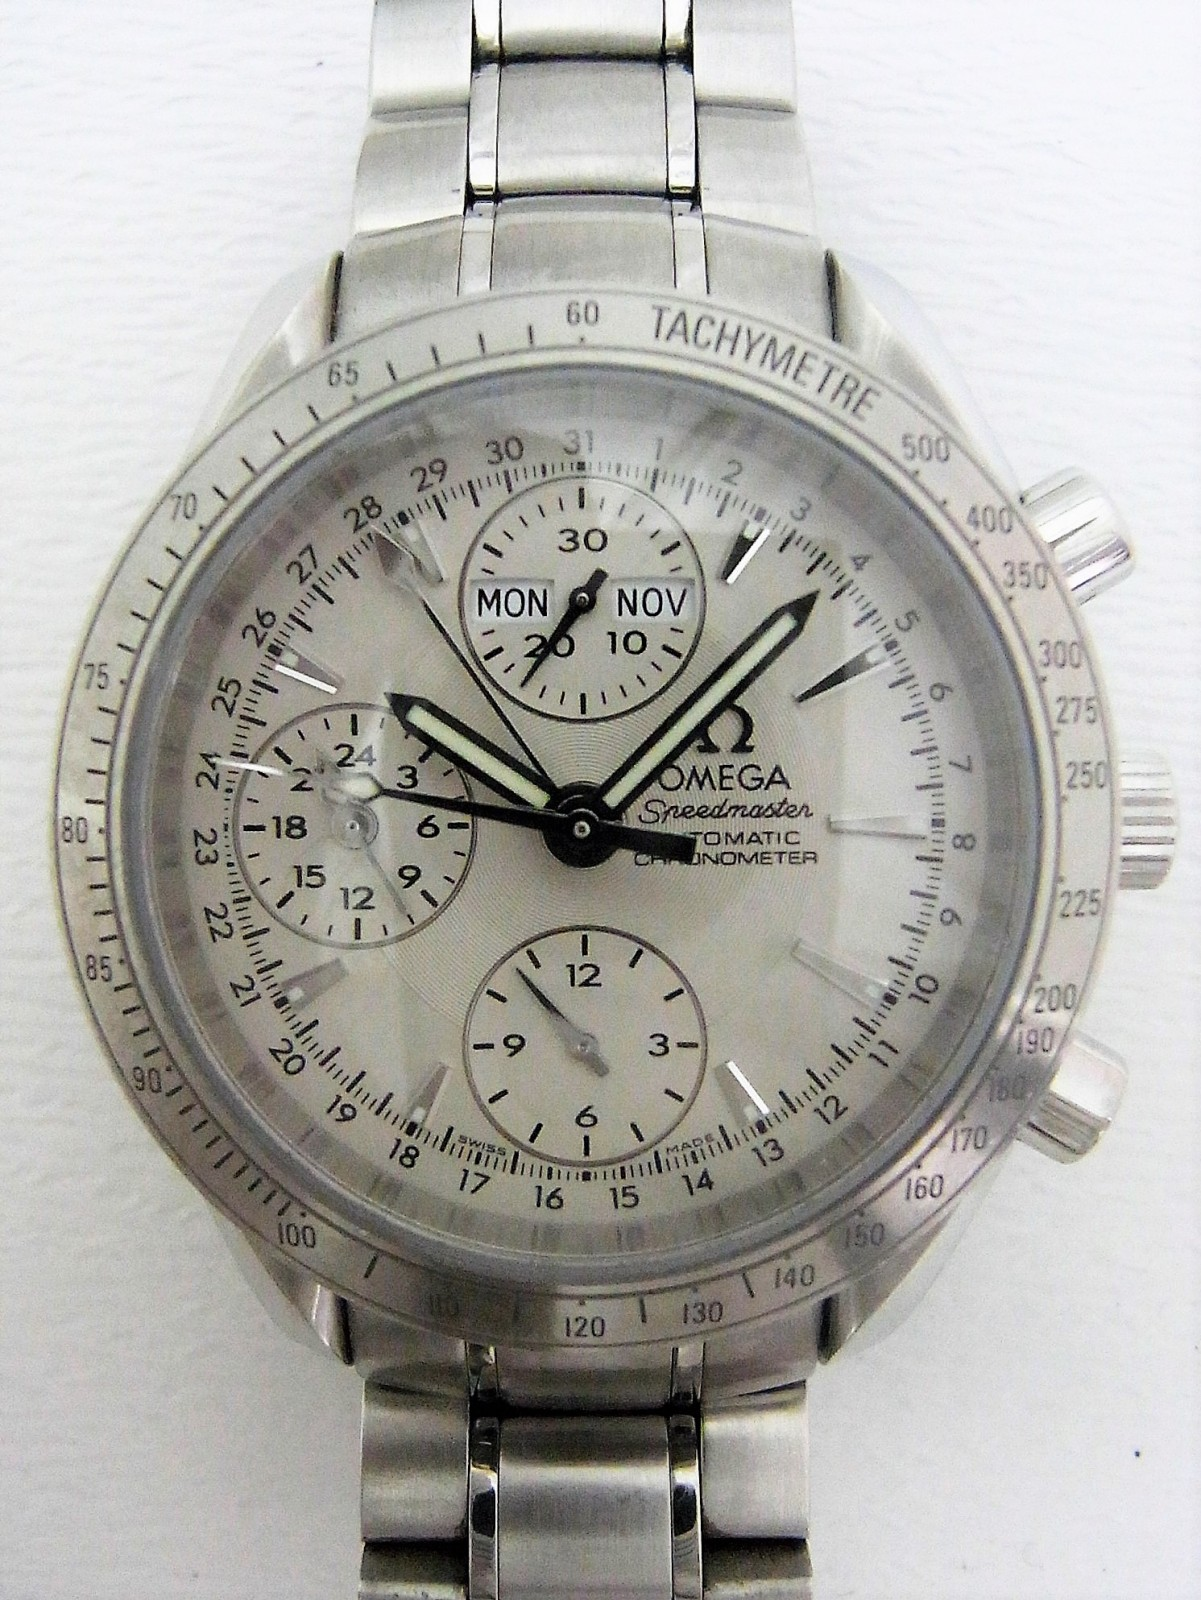 83e207431df Omega Speedmaster Daydate 3221.30 relógio usados (€384) - Timepeaks